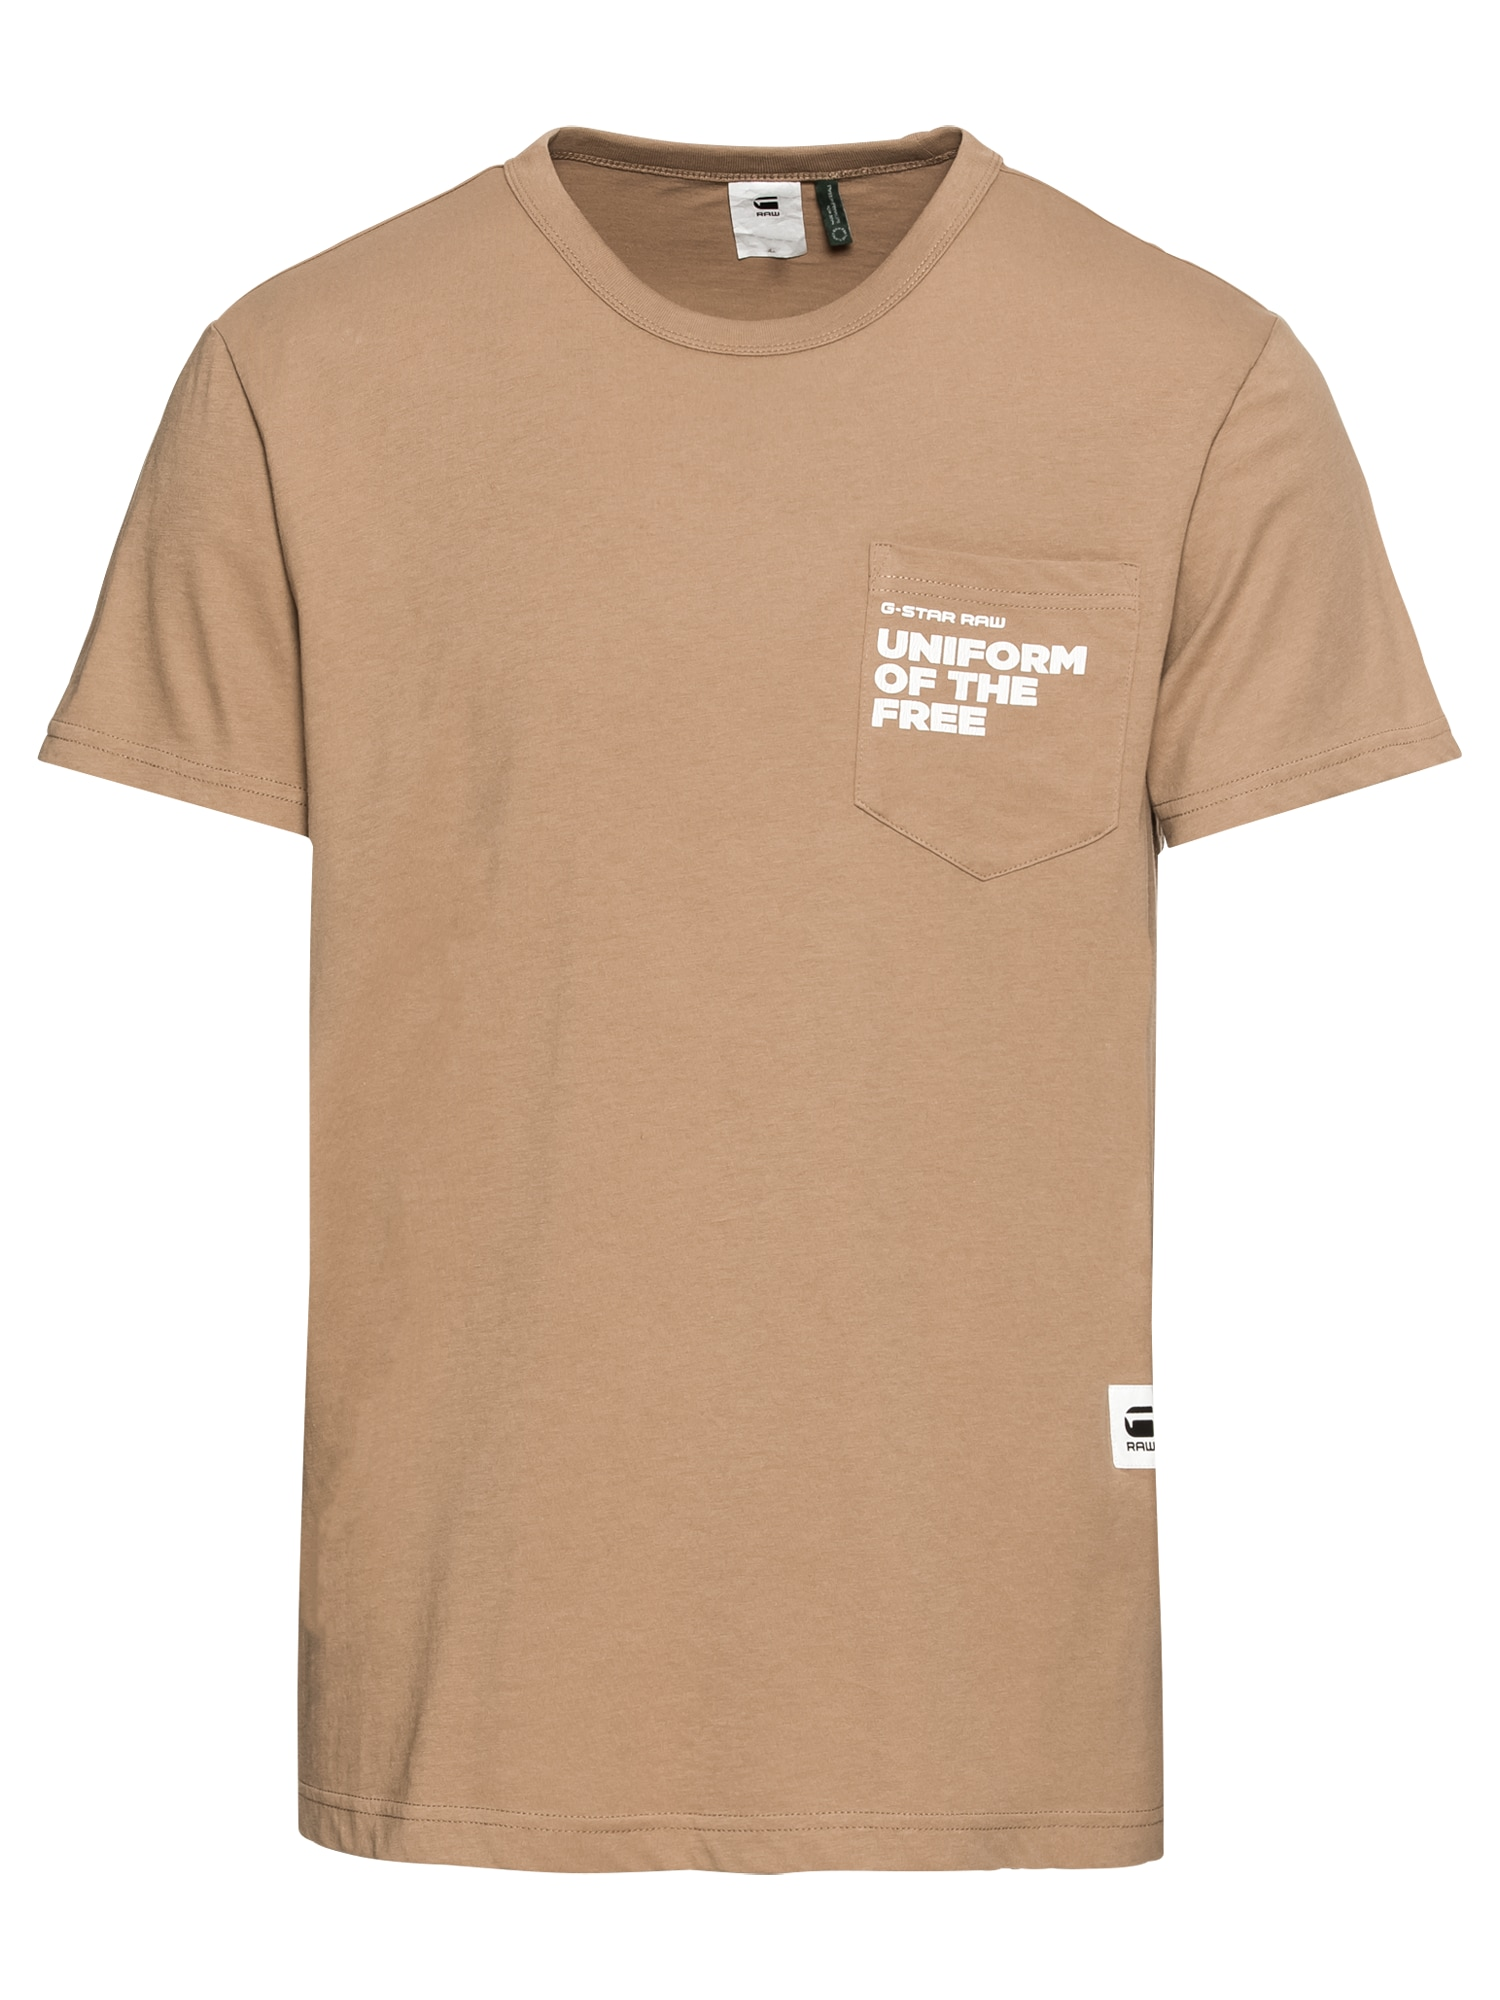 G-STAR RAW Heren Shirt Graphic 5 pocket r t ss camel